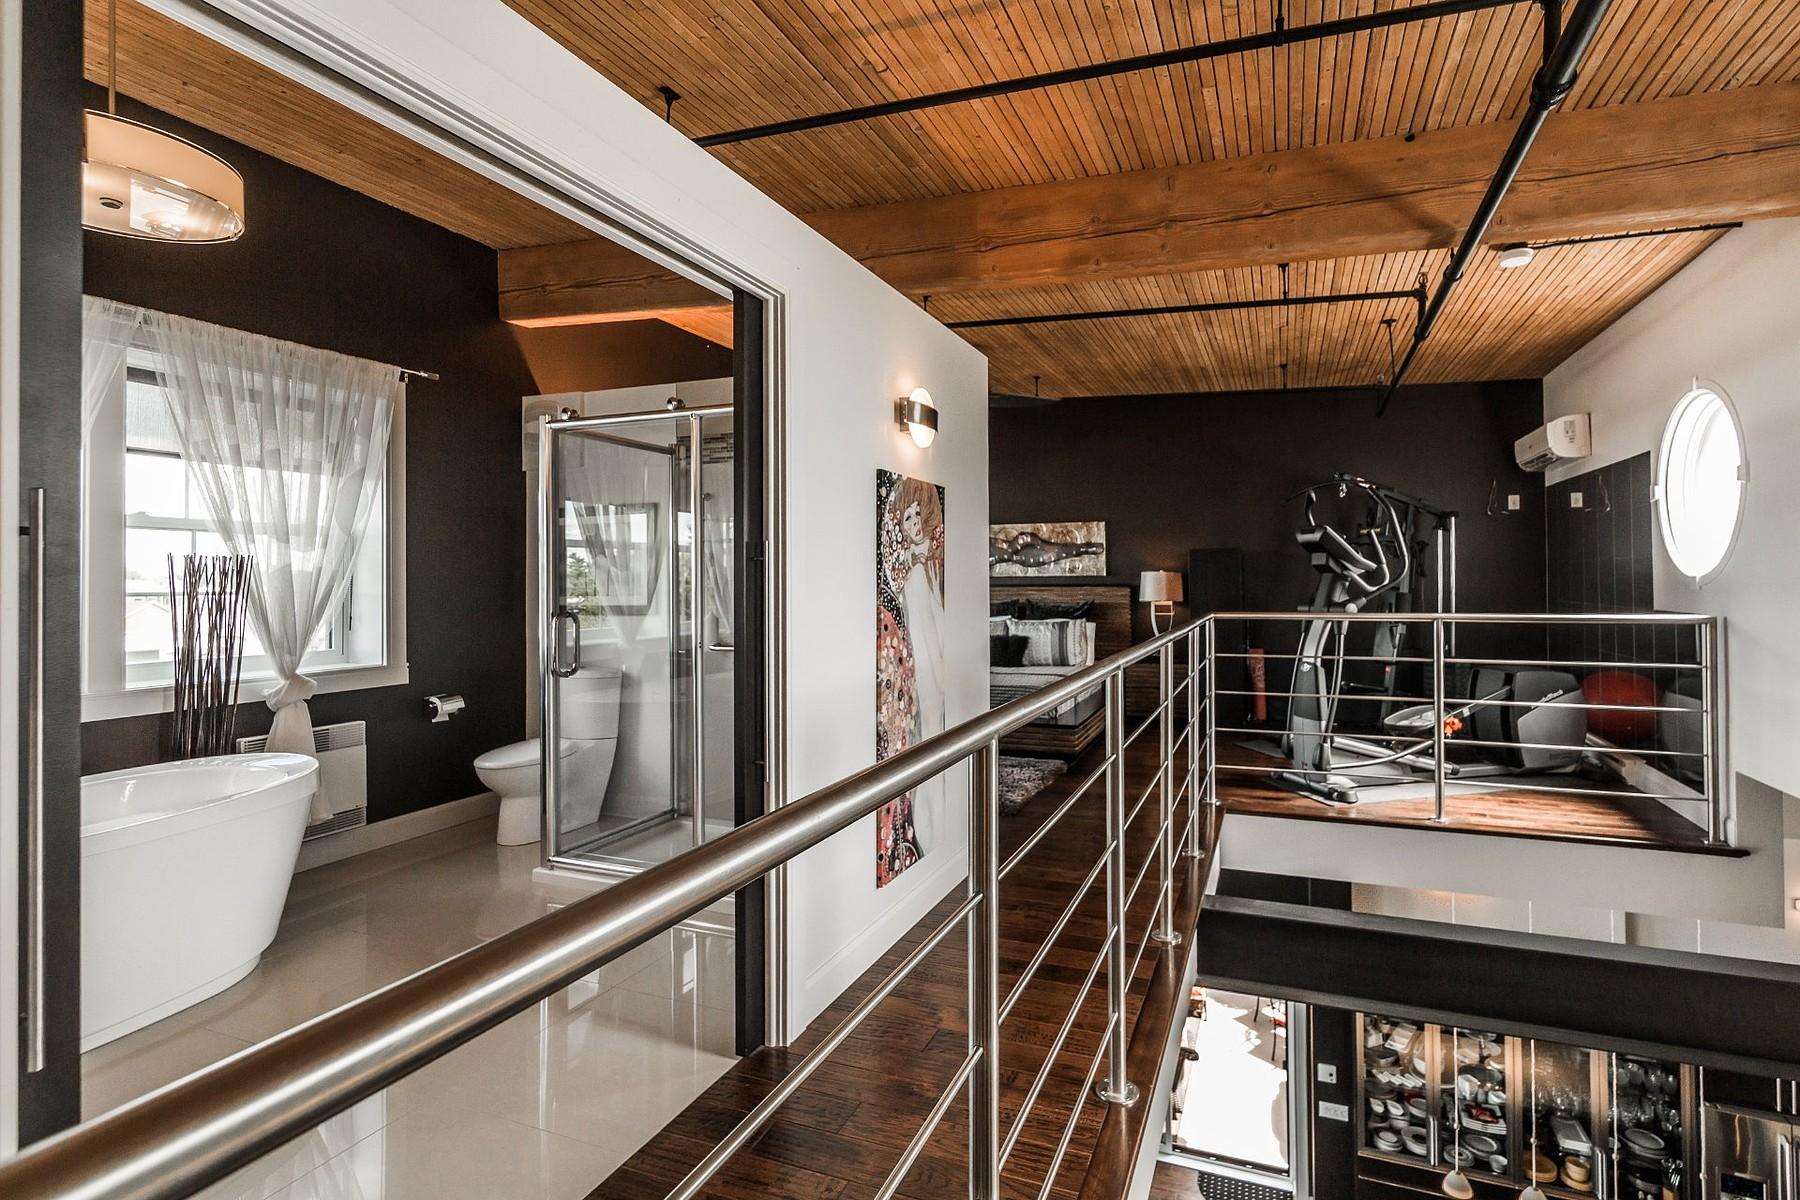 Additional photo for property listing at Saint-Hyacinthe, Montérégie 2020 Av. Lamothe, Apt. 214 Saint-Hyacinthe, Quebec J2S4J8 Canada